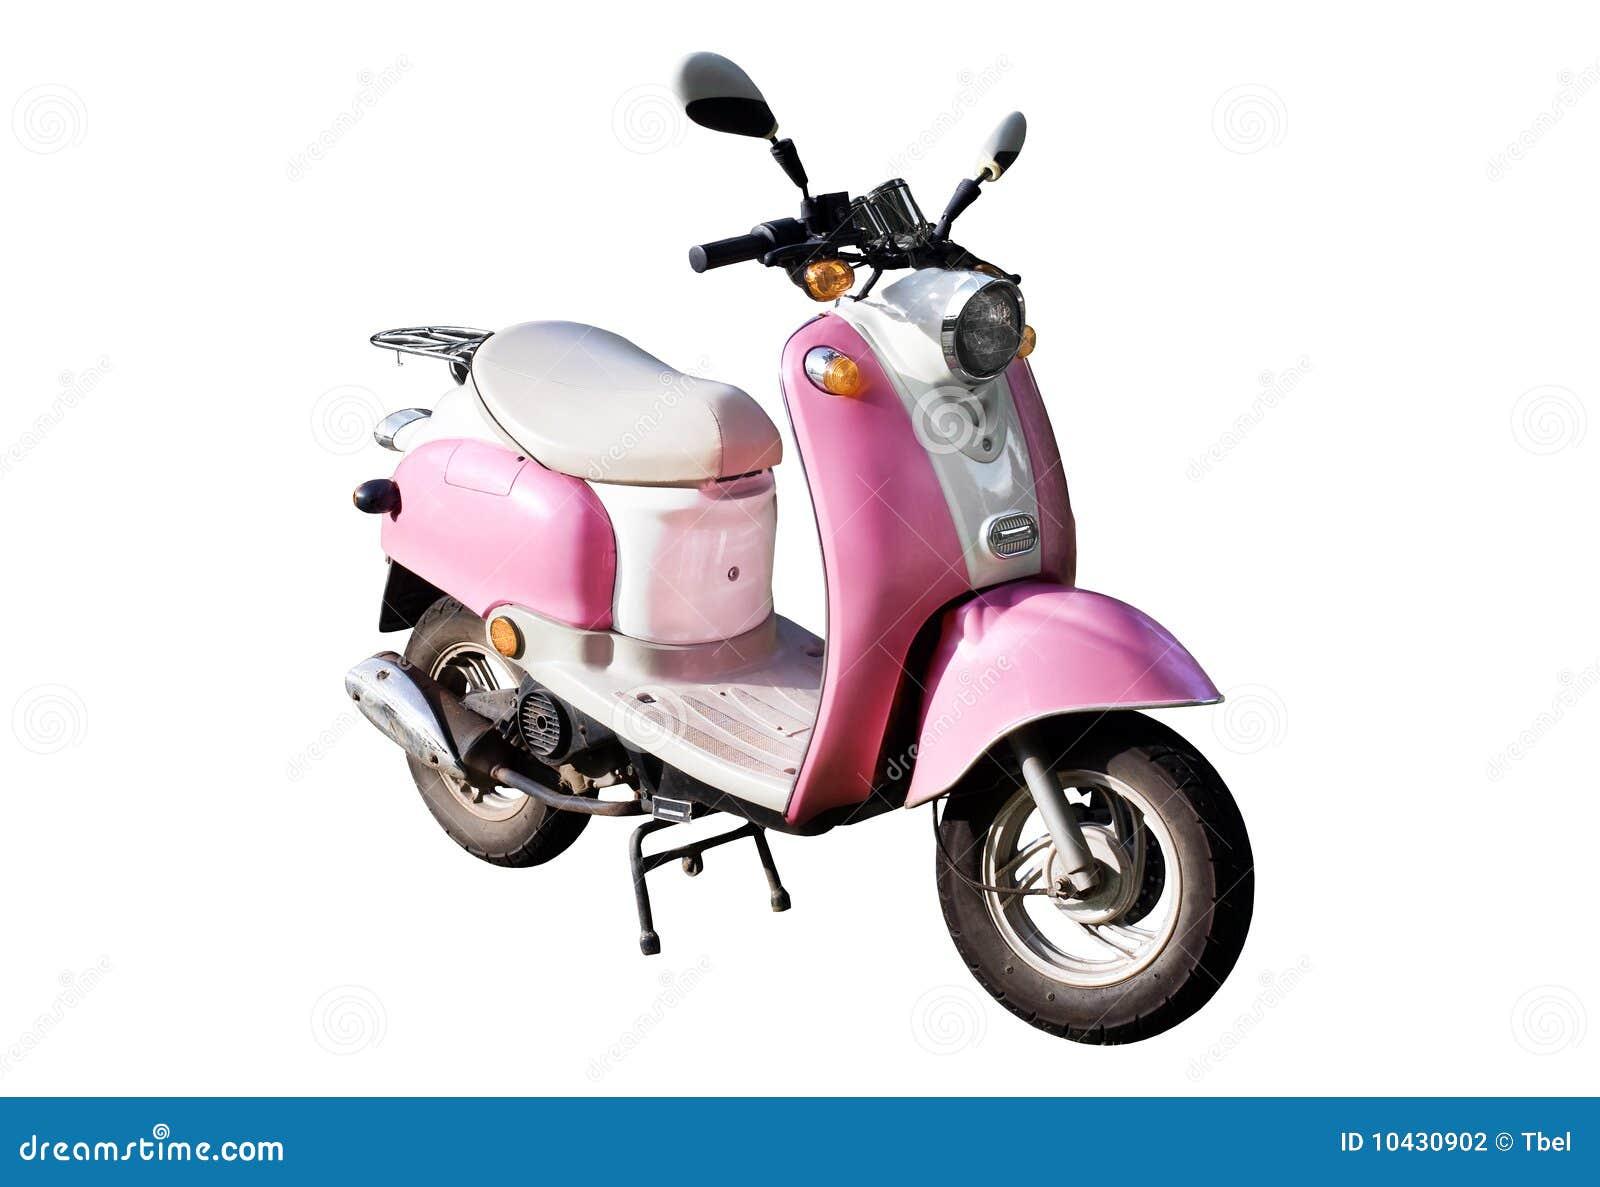 scooter rose de moteur photo stock image du roues rose 10430902. Black Bedroom Furniture Sets. Home Design Ideas